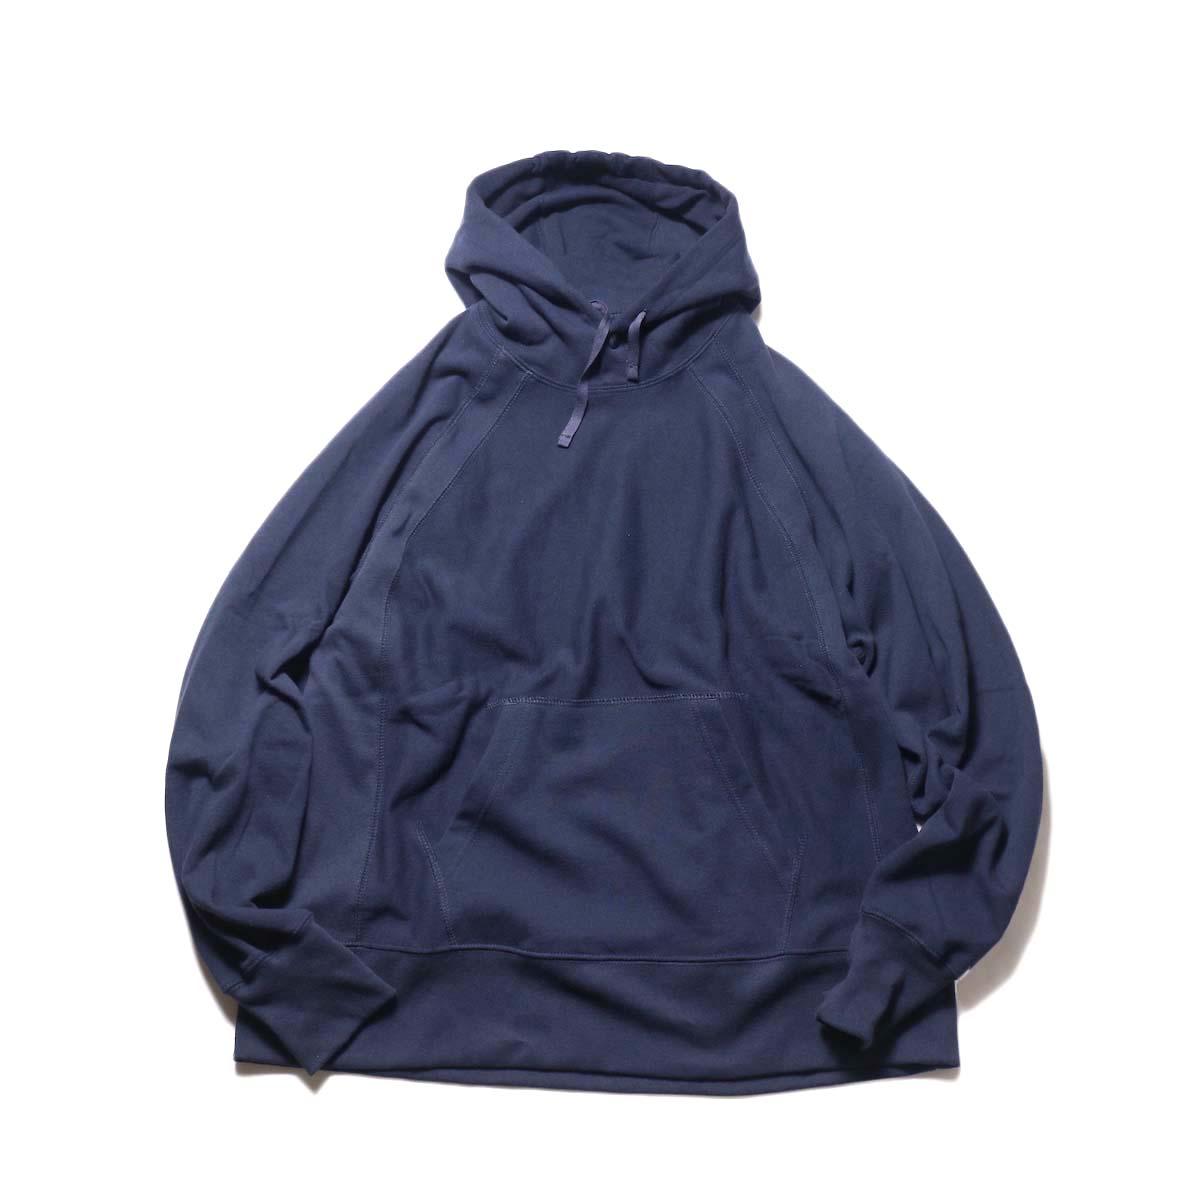 Engineered Garments / Raglan Hoody-Fleece (Dk.Navy)